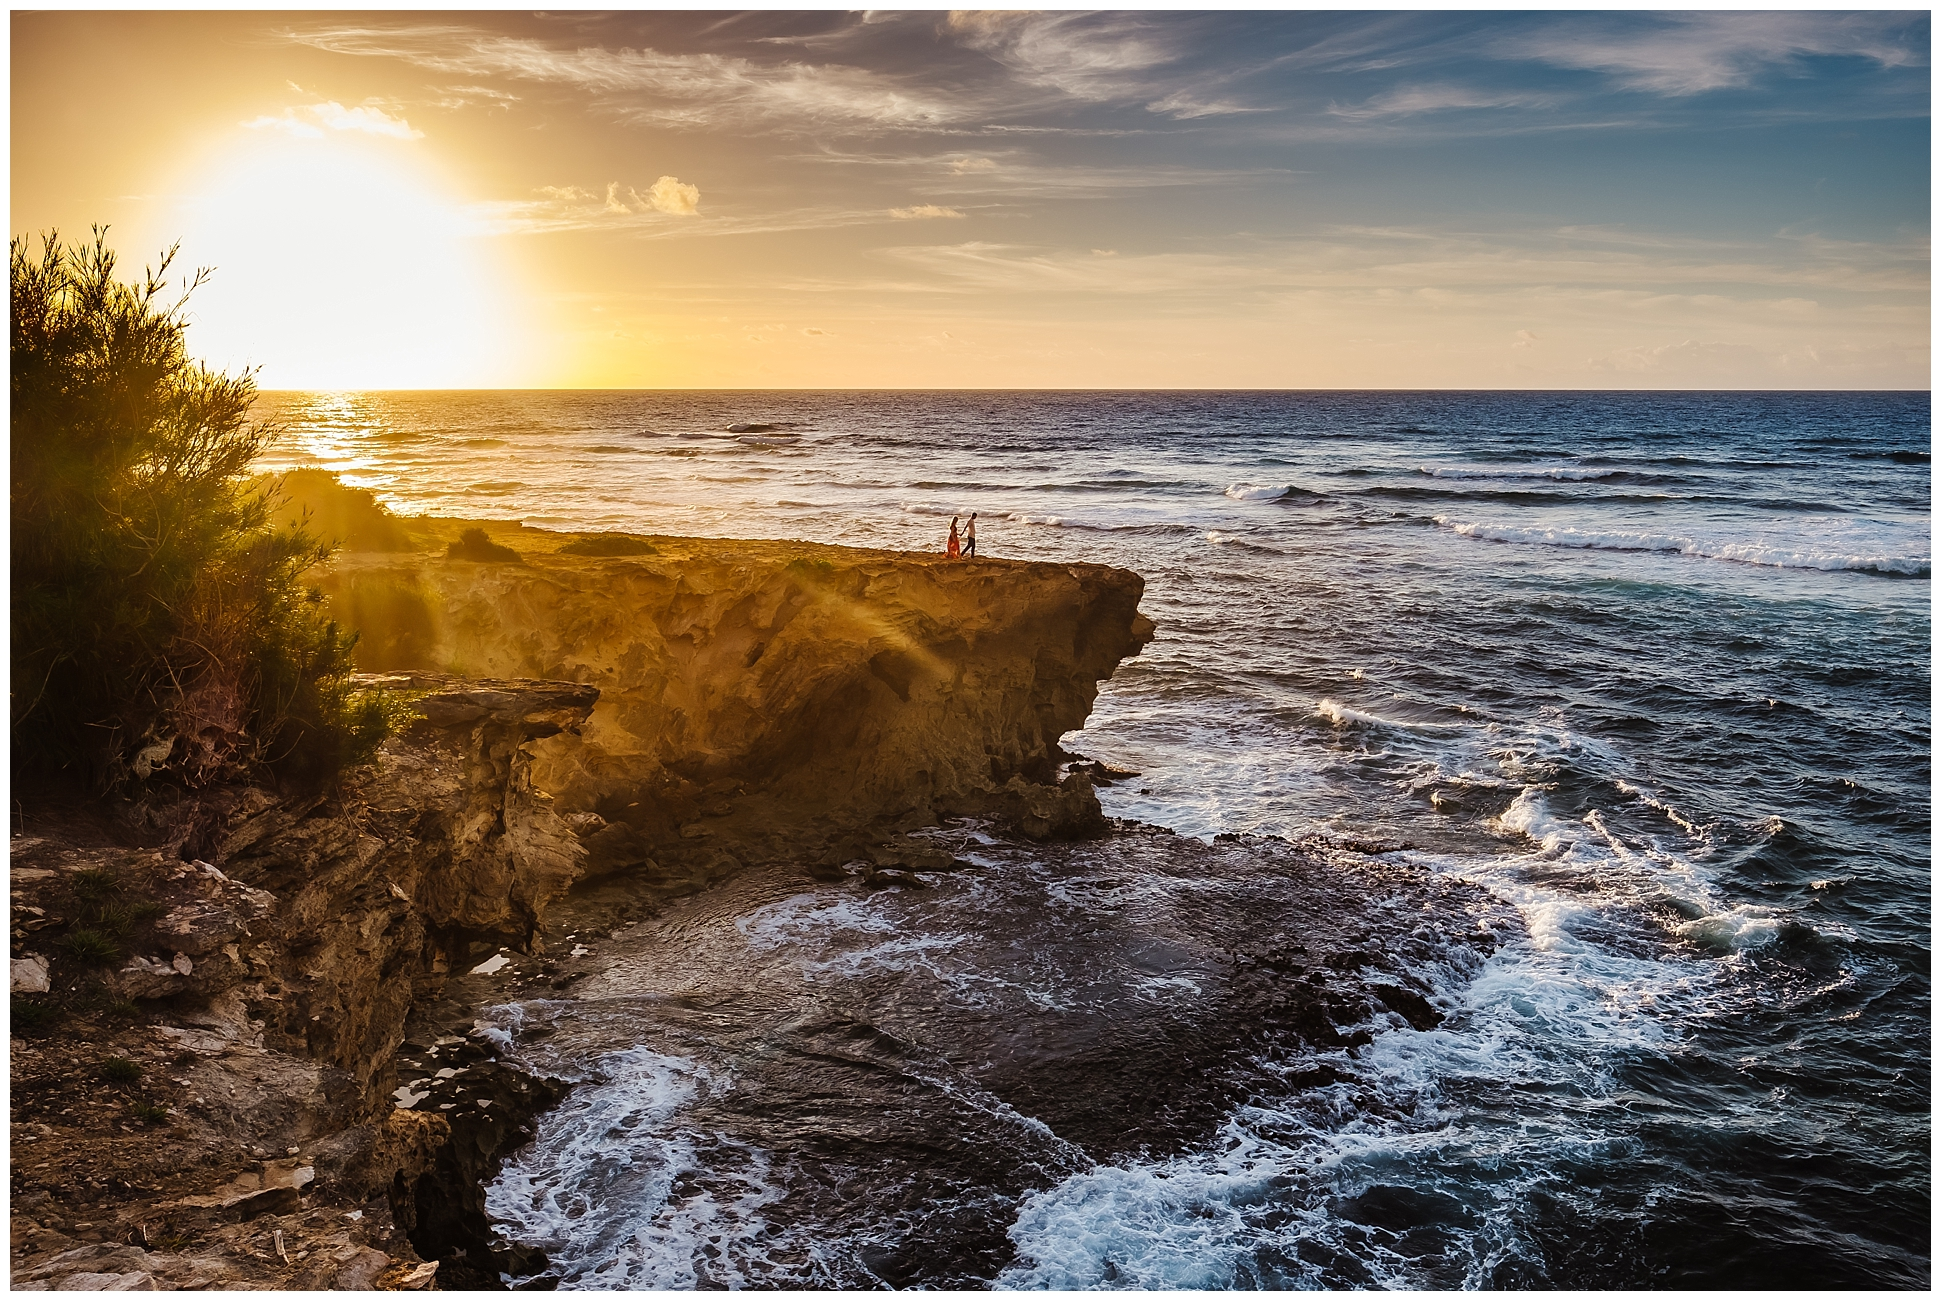 hawaiin-honeymoon-sunrise-portraits-kauai-grand-hystt-destination-photographer_0009.jpg